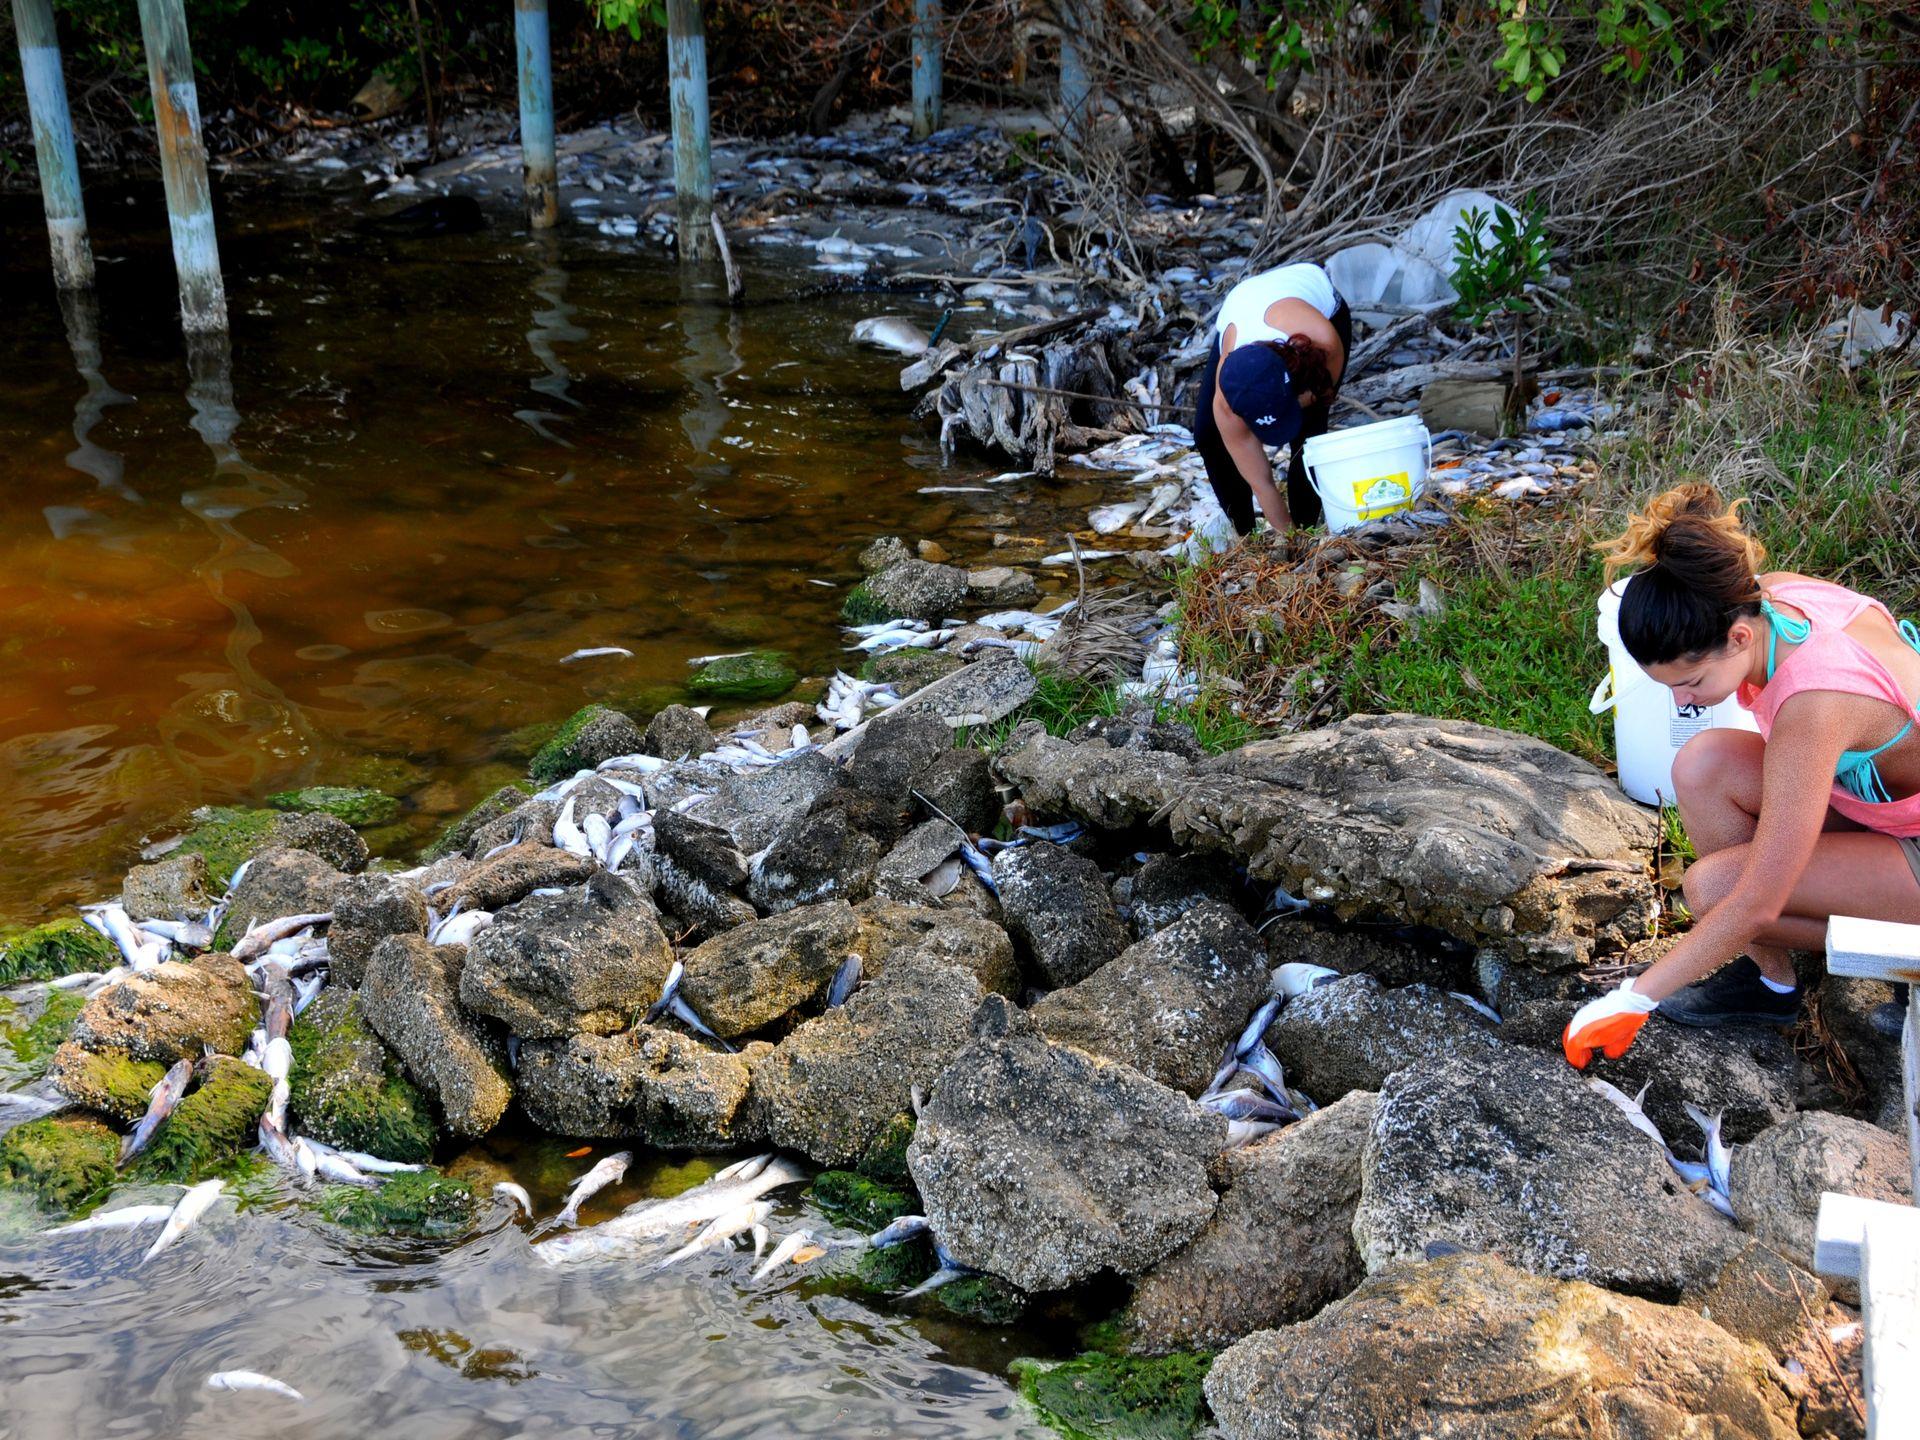 Indian River Lagoon fish kill in Florida, florida fish kill, hundred thousands of fish dead in florida, mysterious fish kill in florida, florida indian riverlagoon fish kill, florida fish kill march 2016